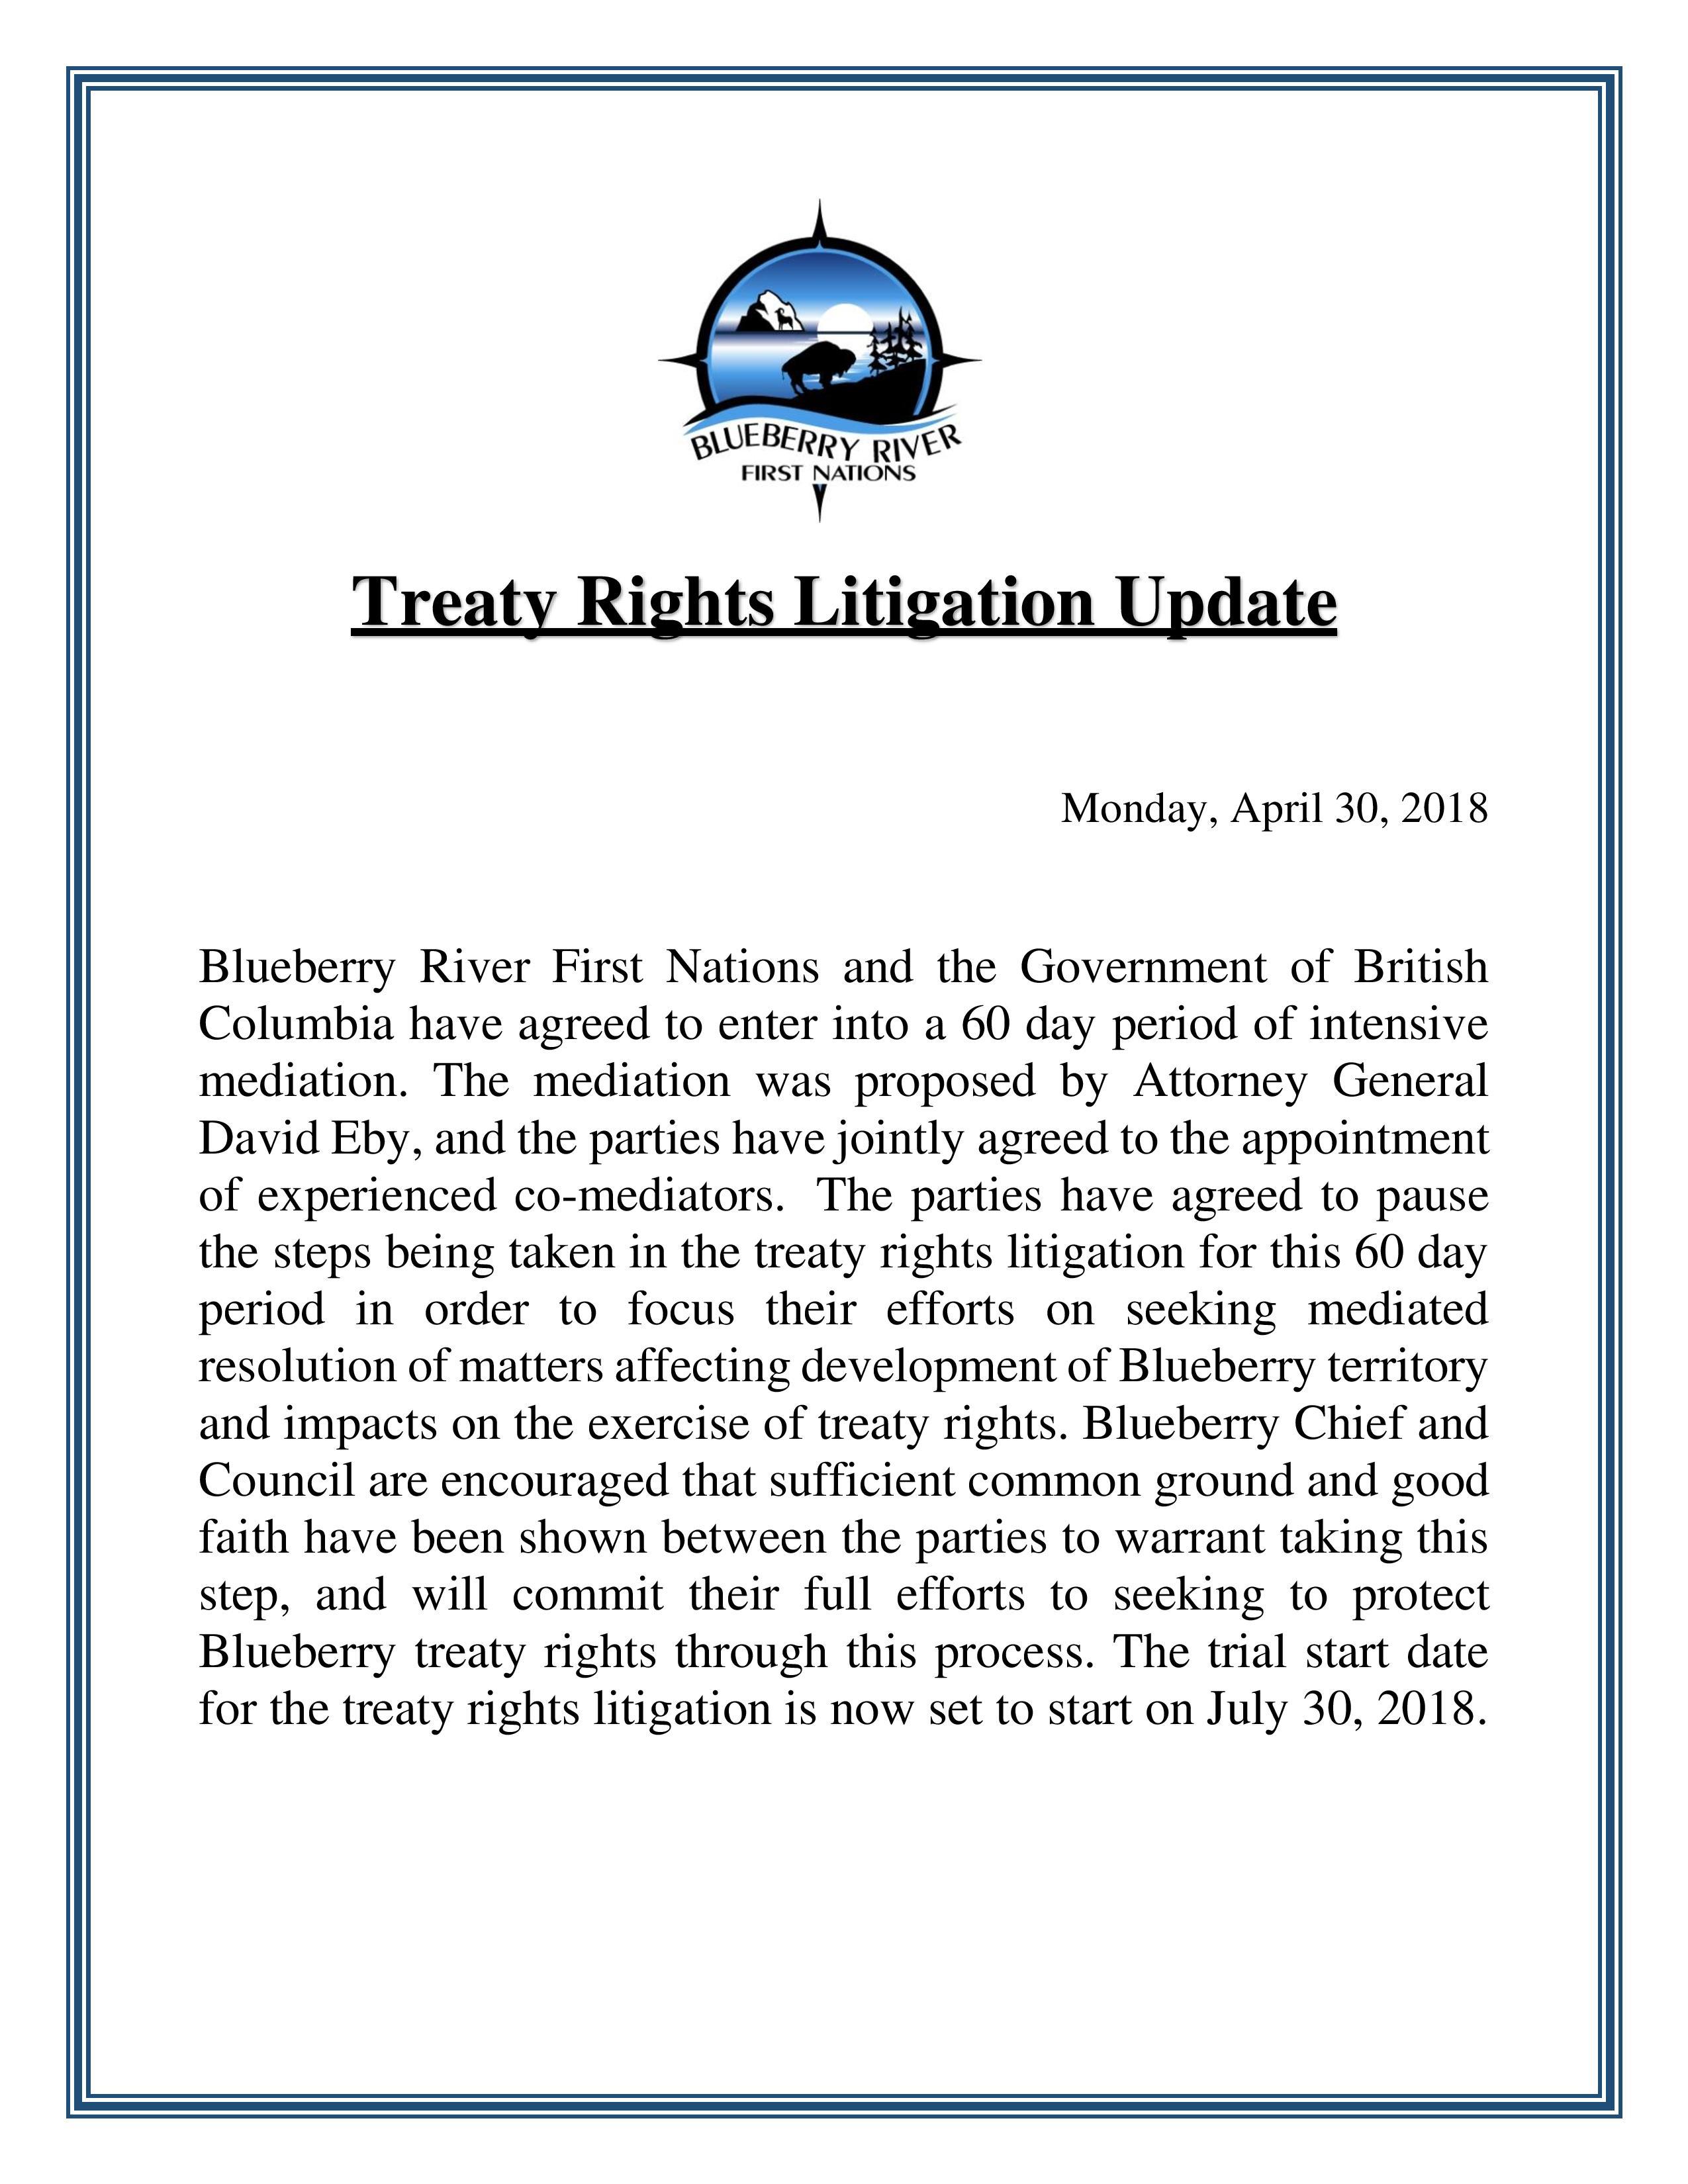 Treaty Rights Litigation Update Apr.26.18-page-001.jpg